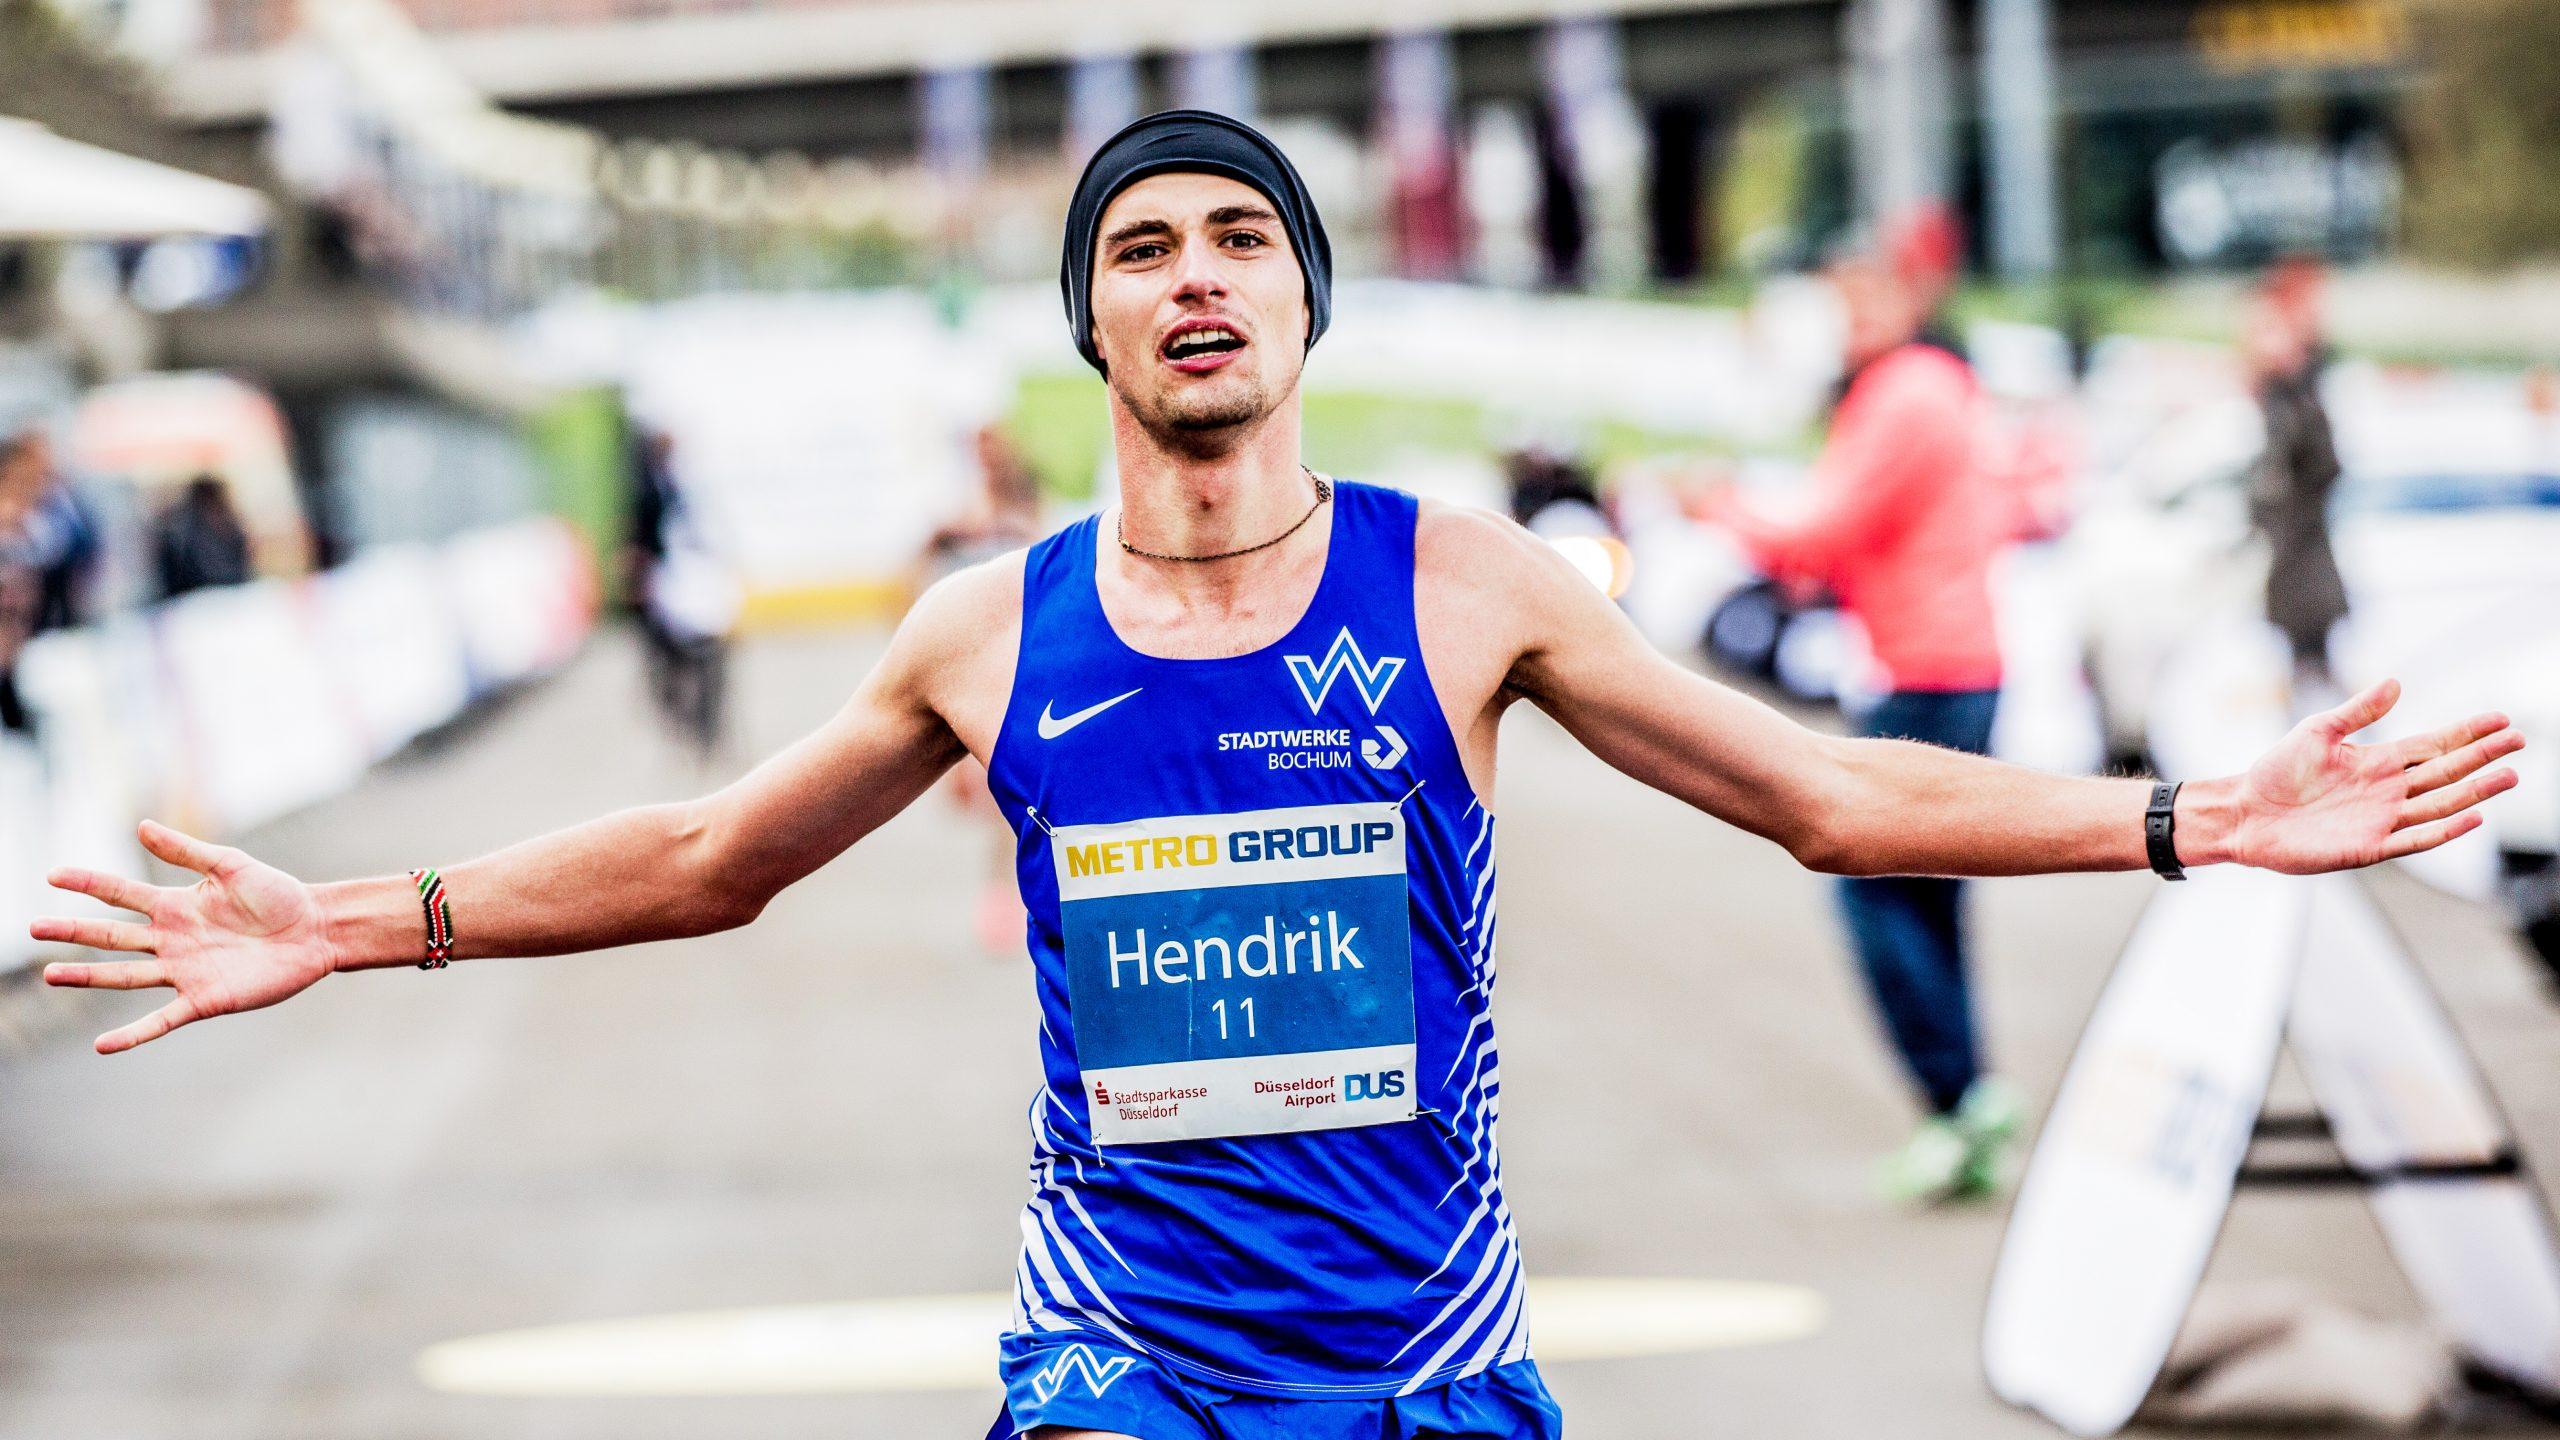 Verletzung im Spitzensport: Hendrik Pfeiffer